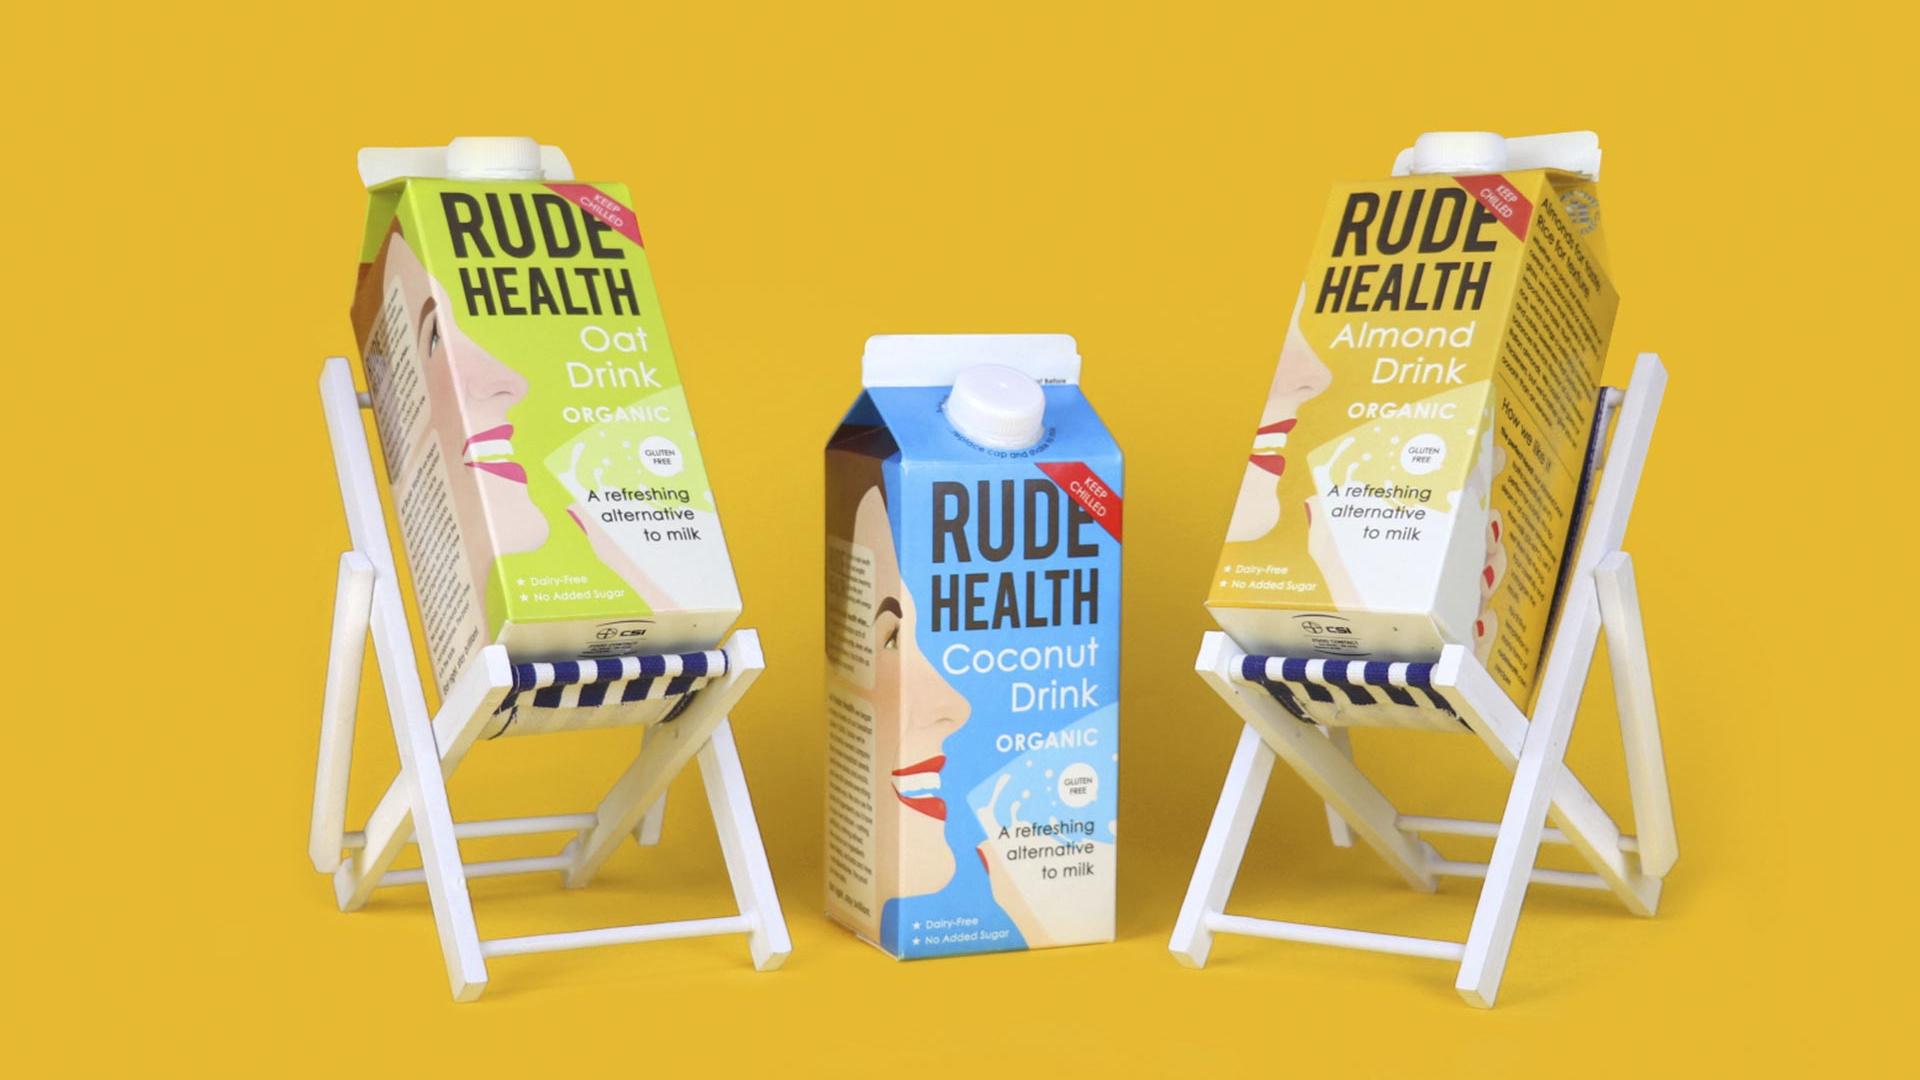 Rude Health's oat, almond and coconut milks